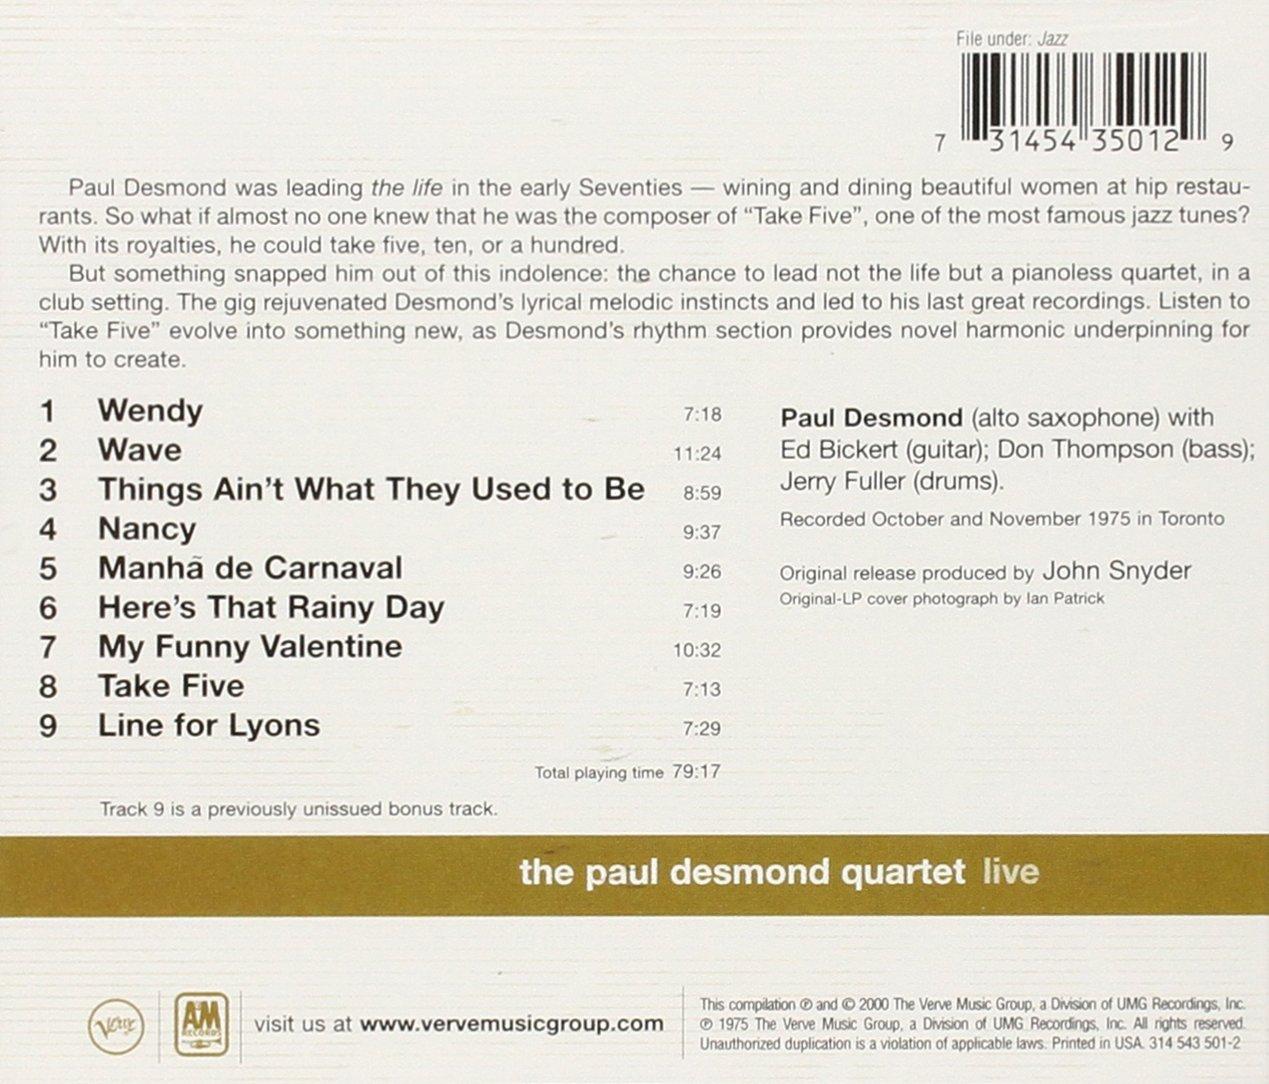 Paul Desmond Quartet Live by Polygram